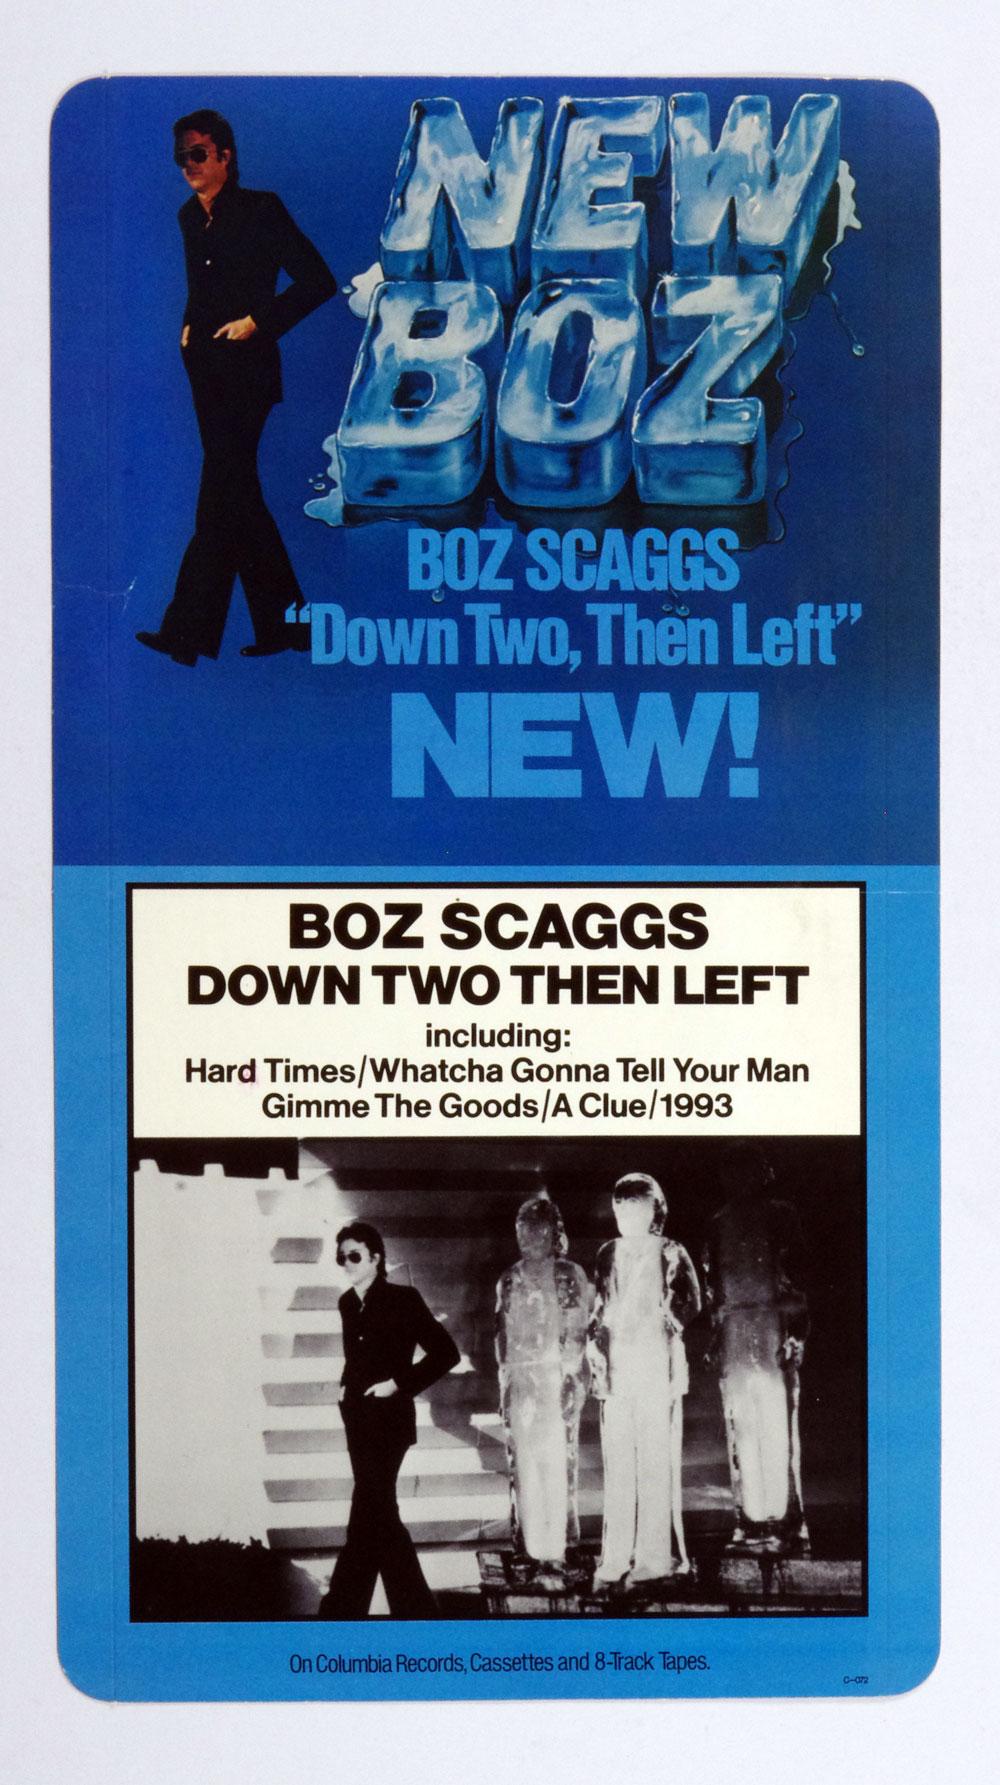 Boz Scaggs Poster Cardboard Down Two Then Left 1977 New Album Promo  12 x 22